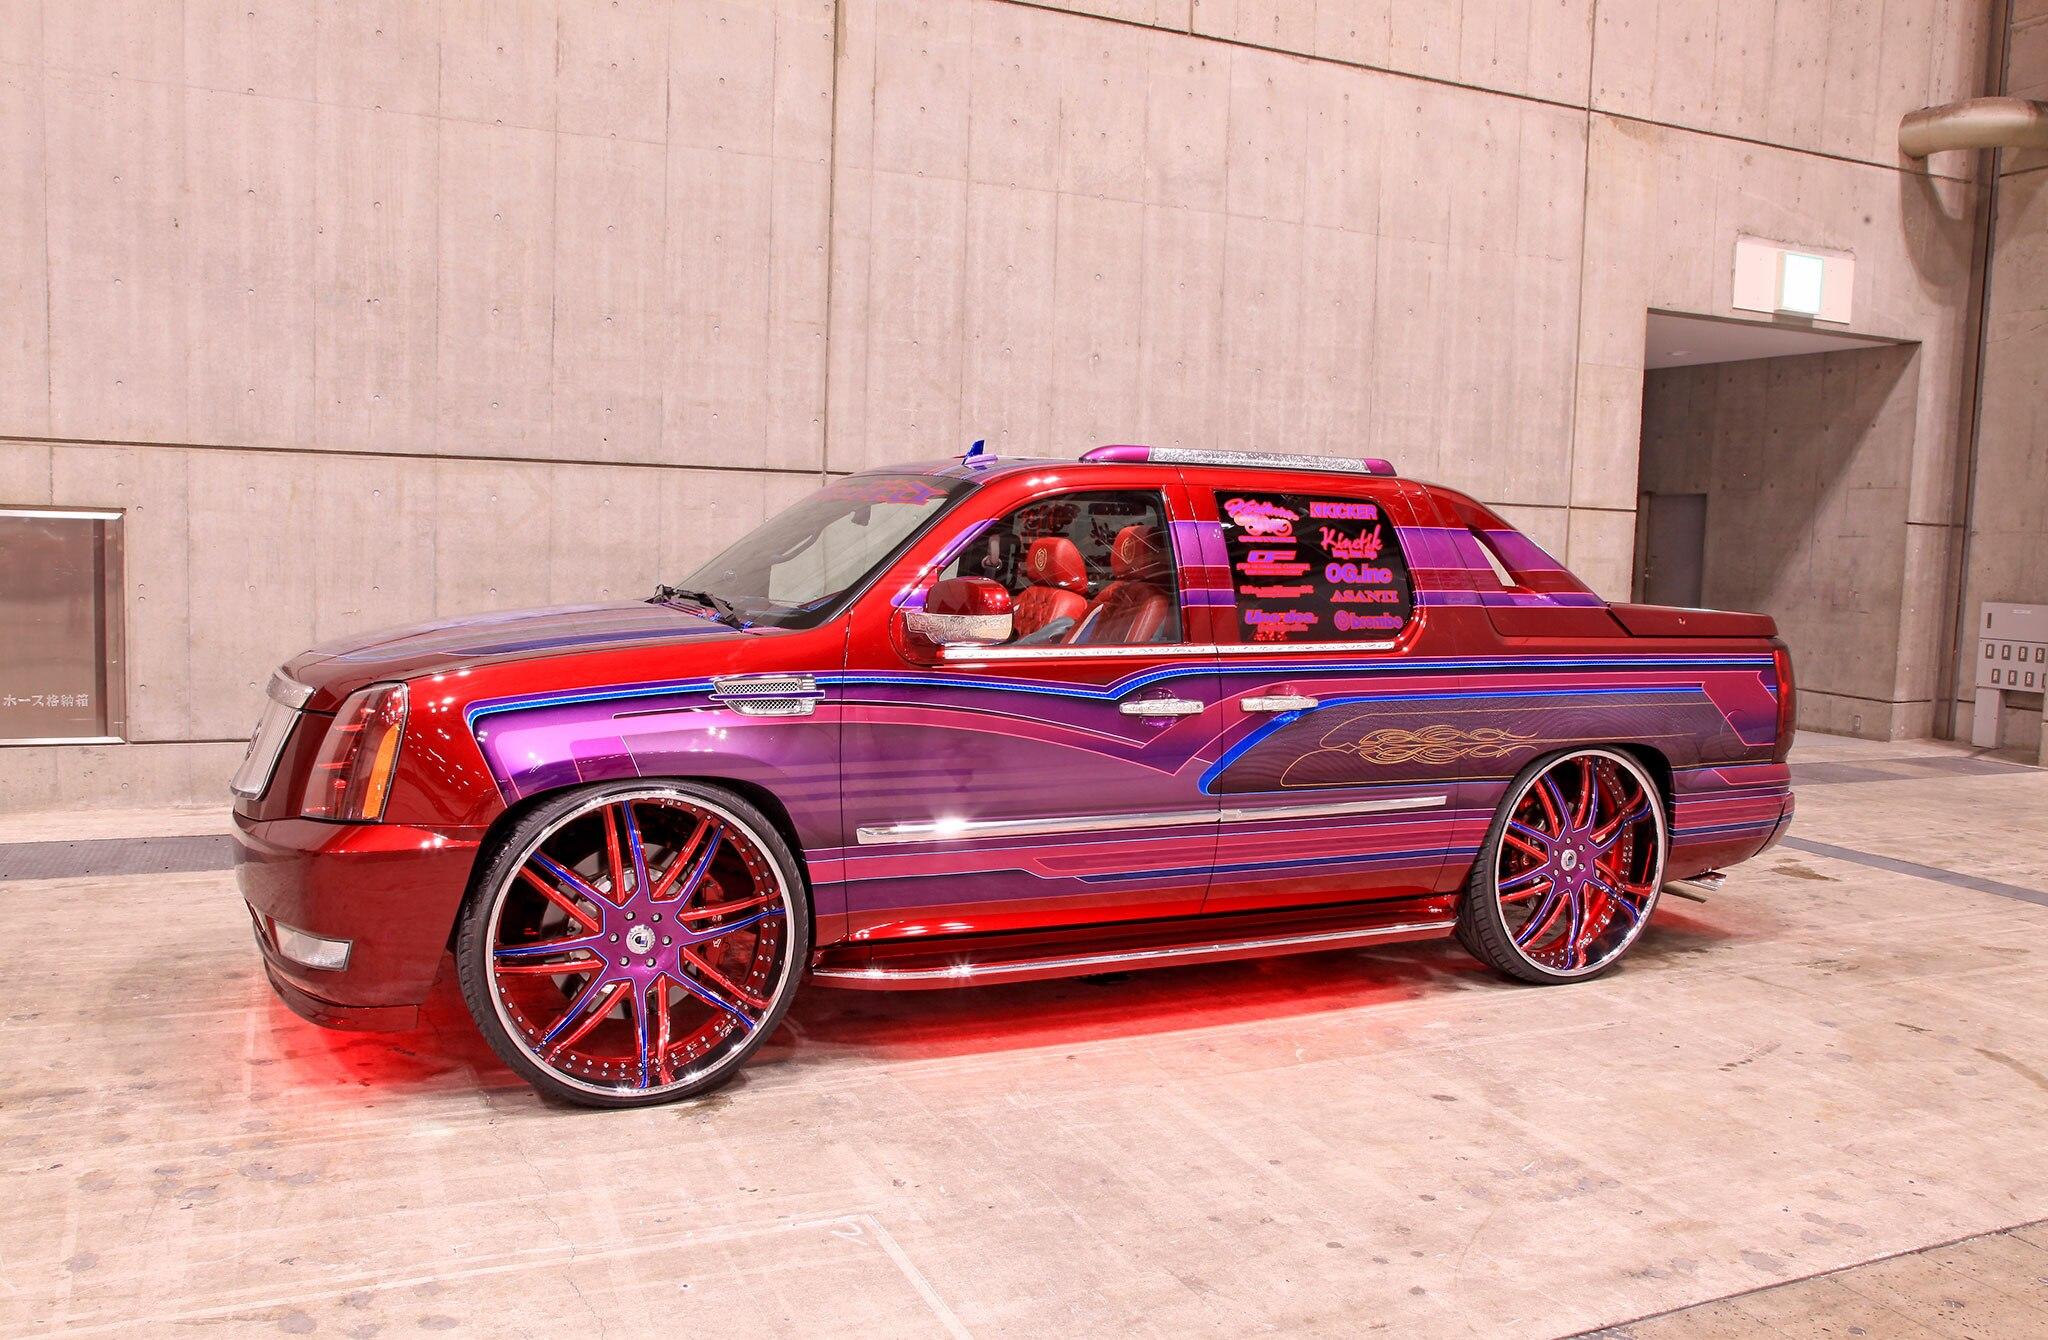 2008 Cadillac Escalade EXT - Play On Playa